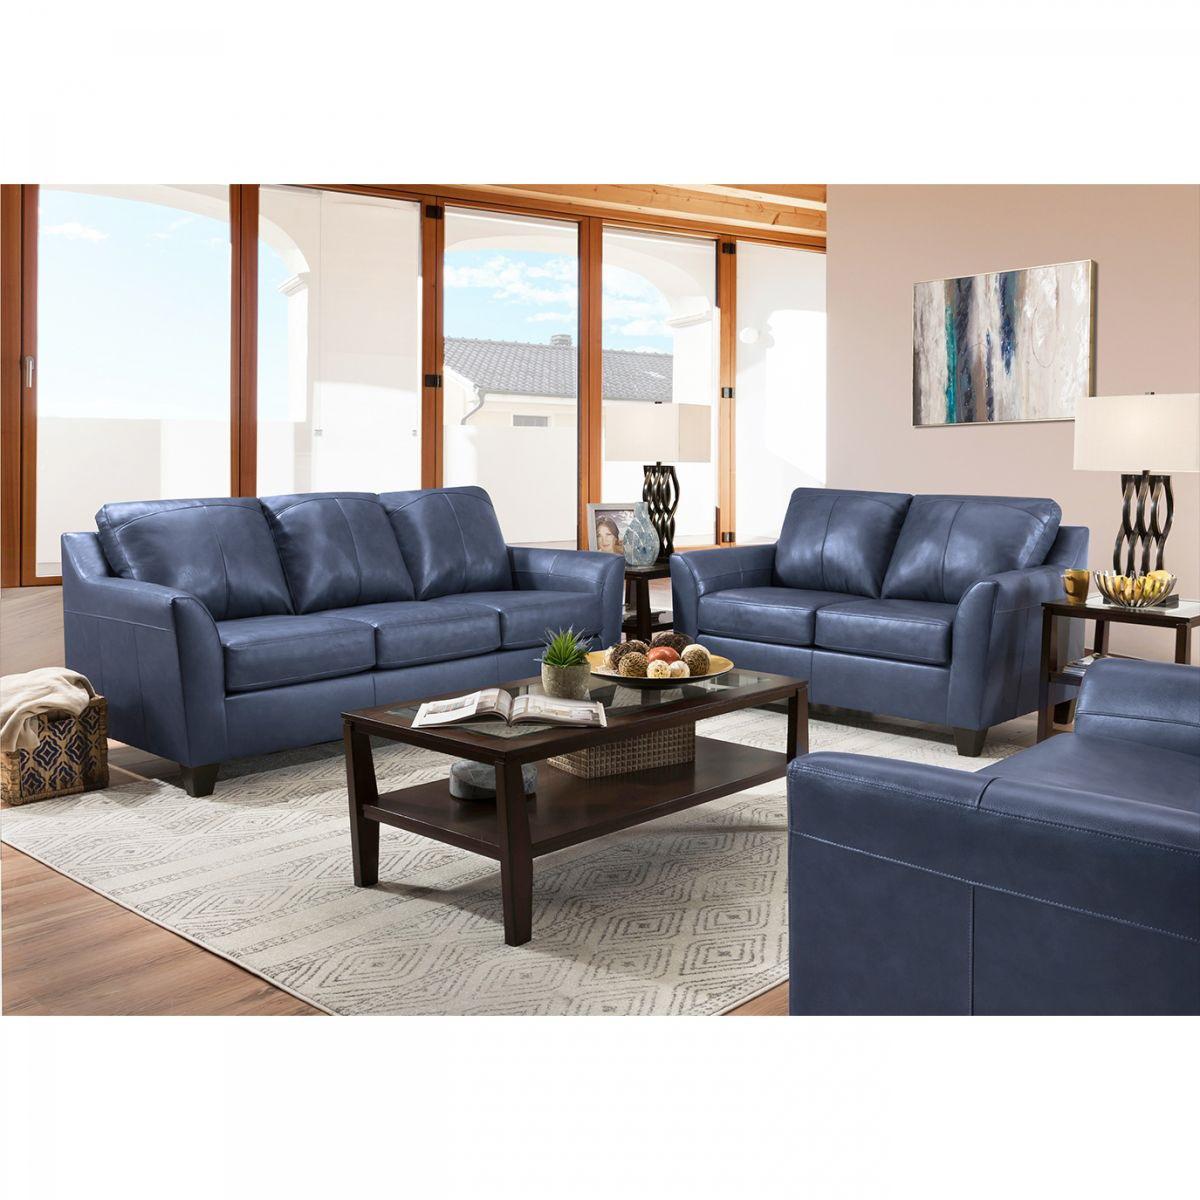 Regal Blue Leather Sofa Loveseat